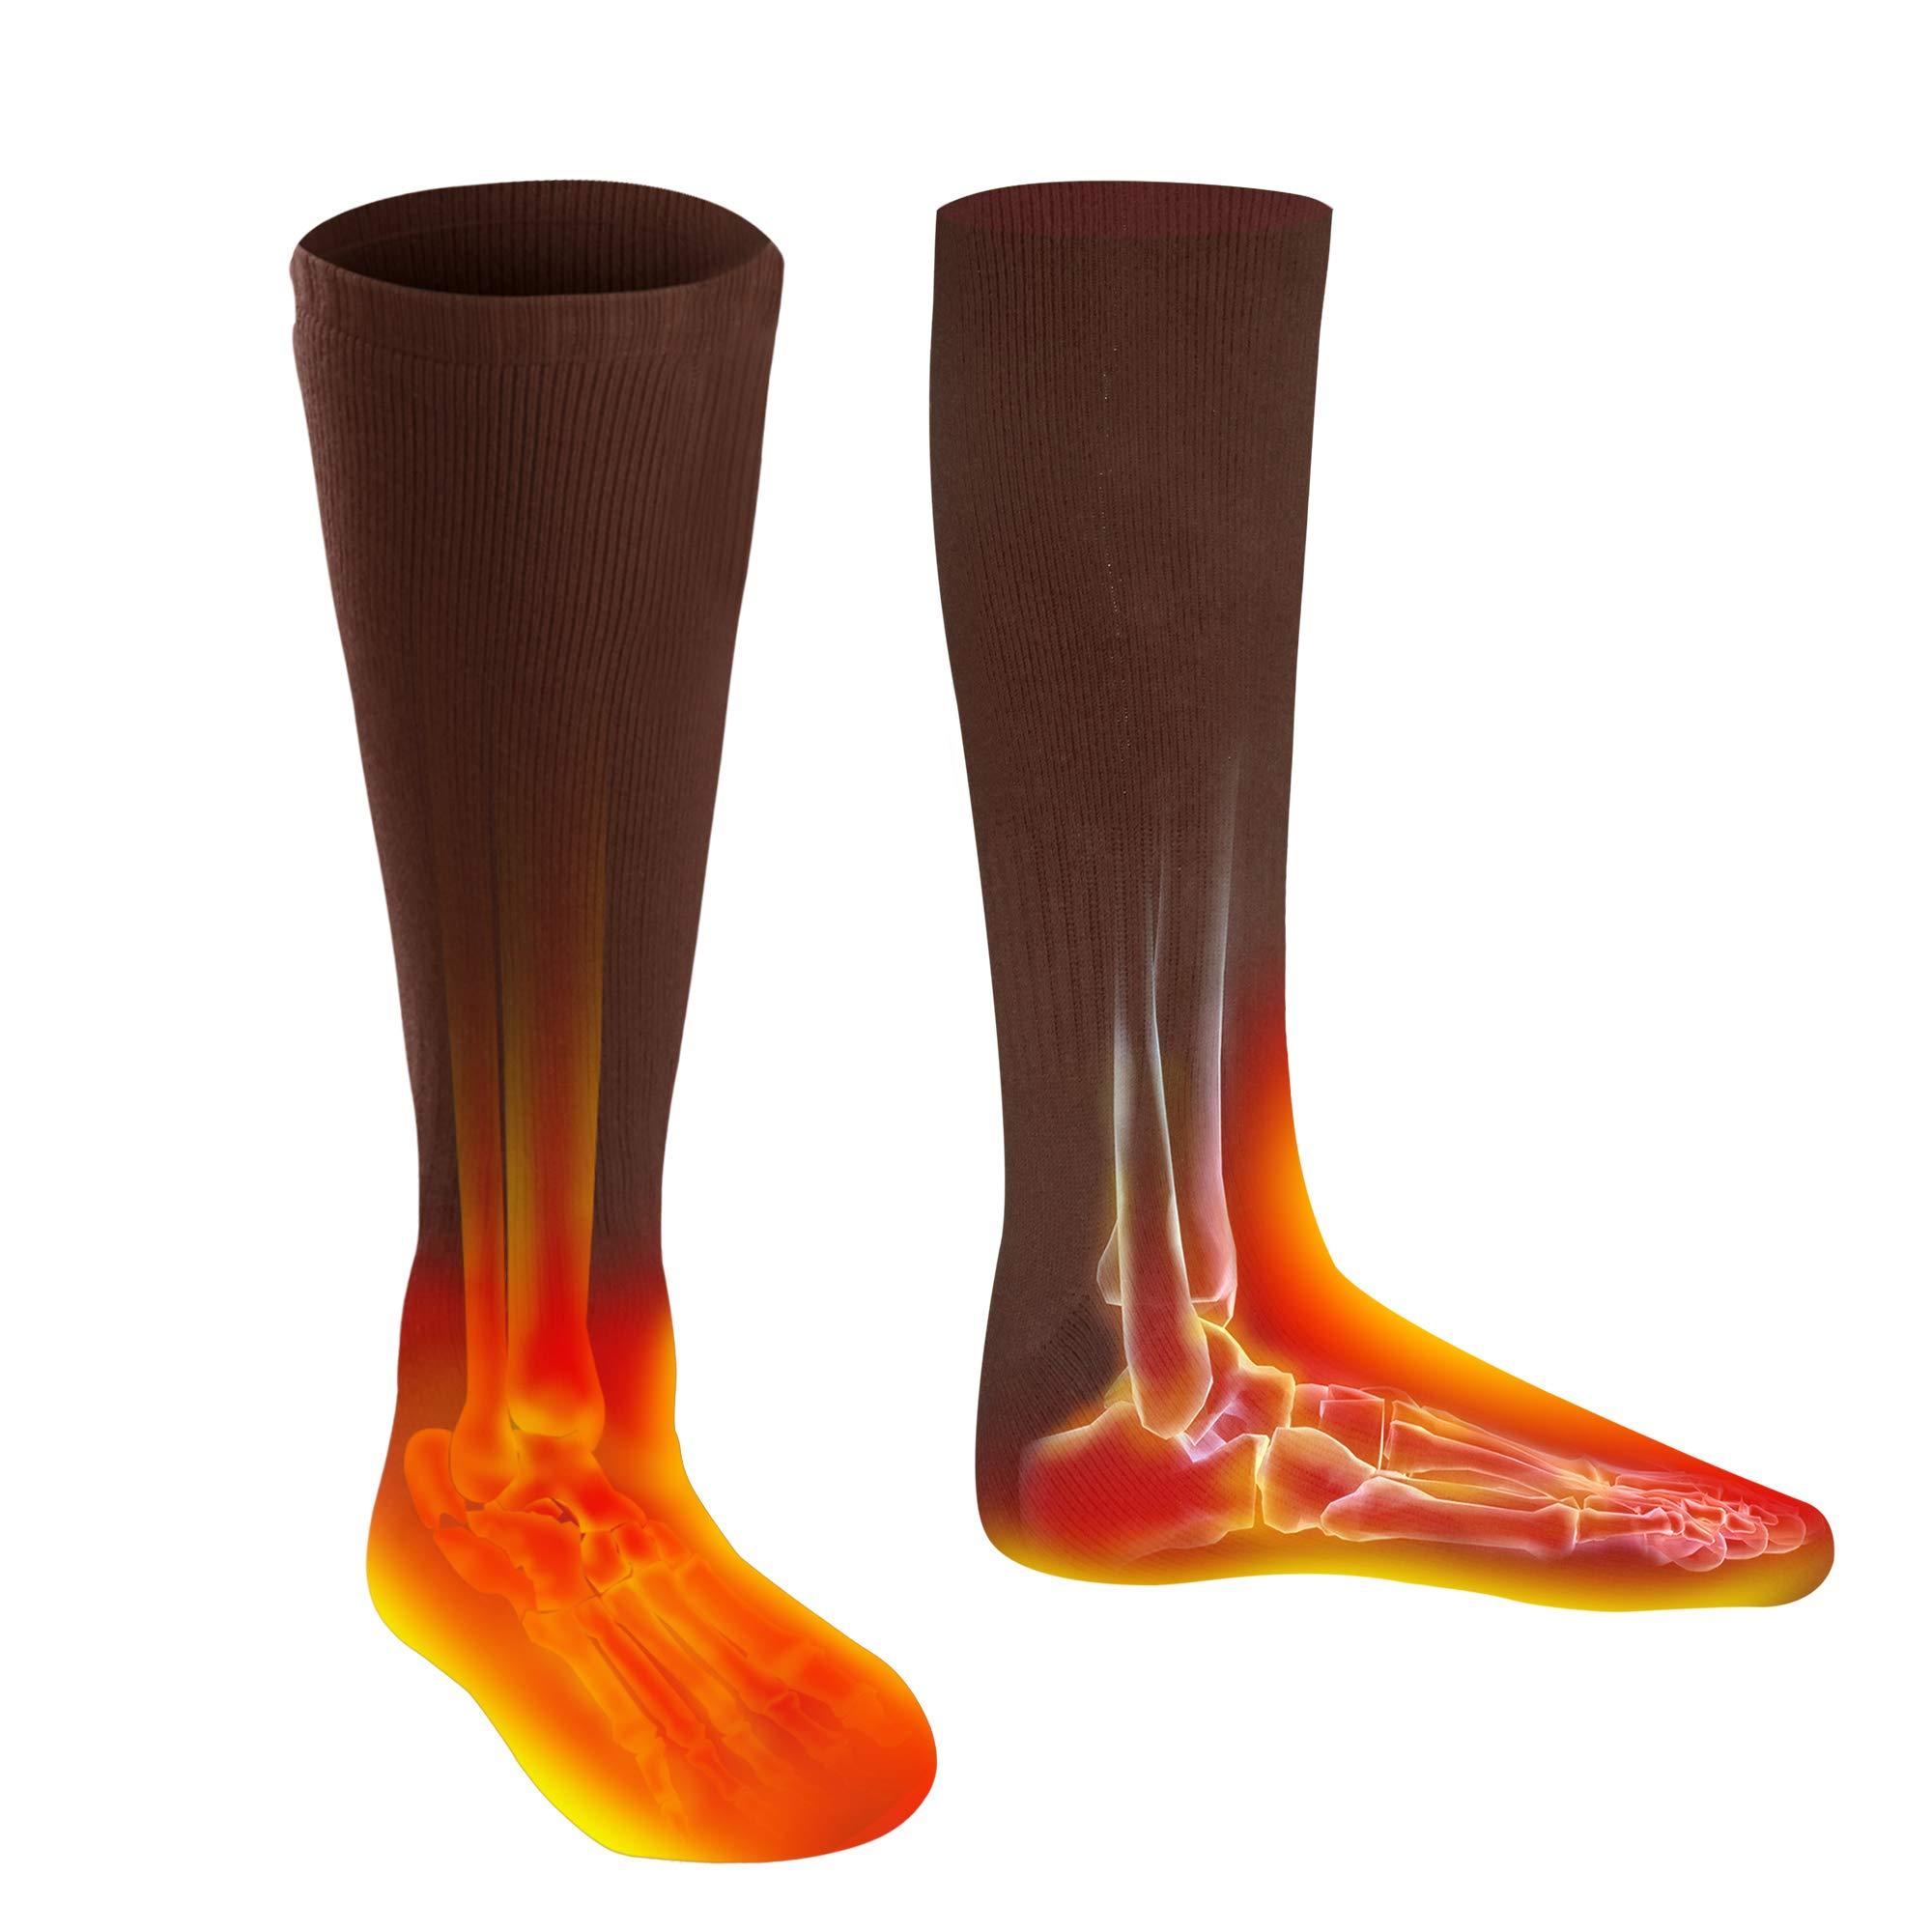 Men Women Socks Electric Socks Heated Socks for Chronically Cold Feet, Rechargeable Batteries Socks Hiking Socks Skiing Socks Socks(Brown) by Highting